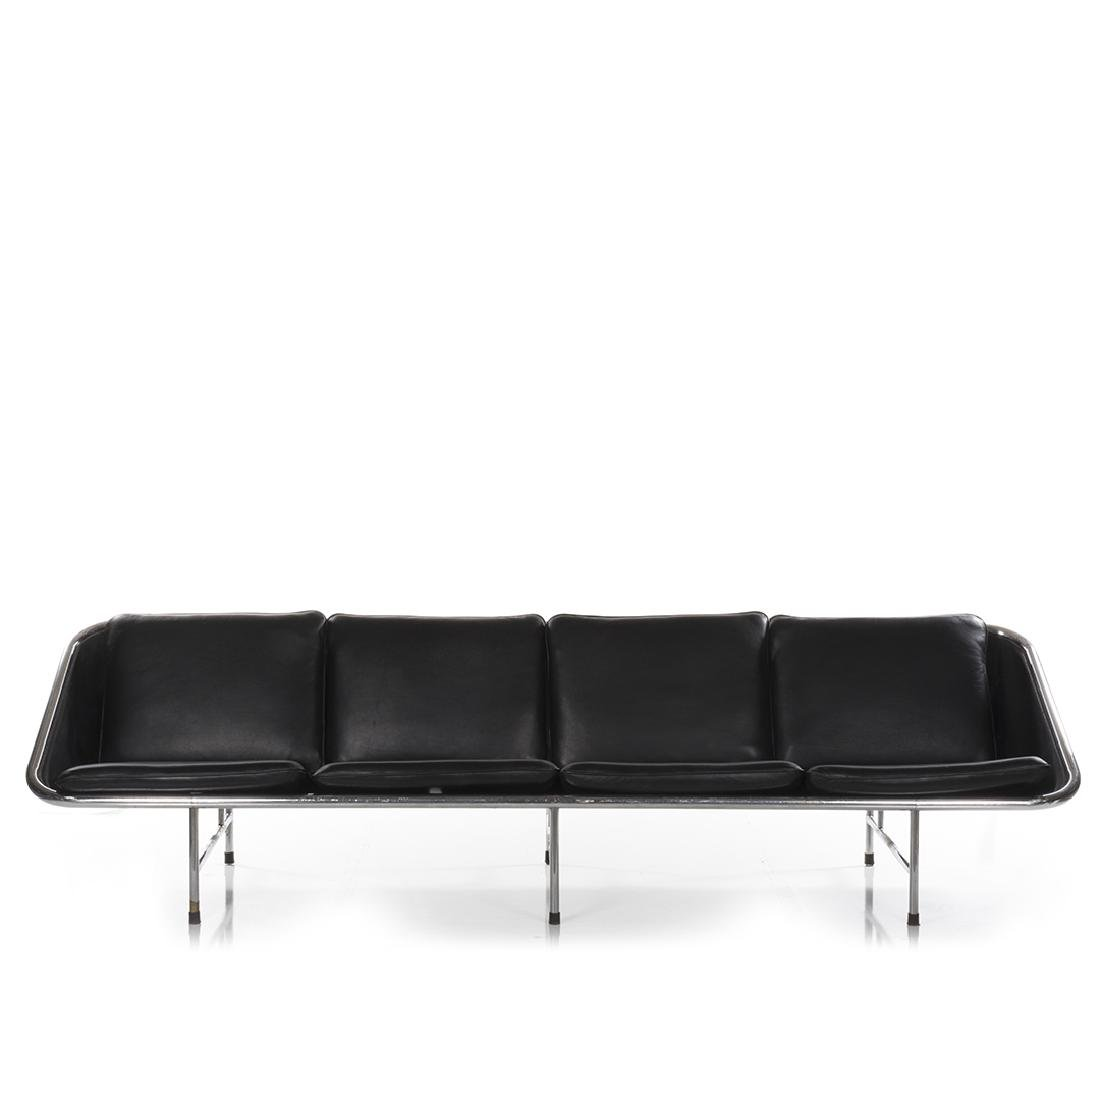 George Nelson Sling Sofa - 2